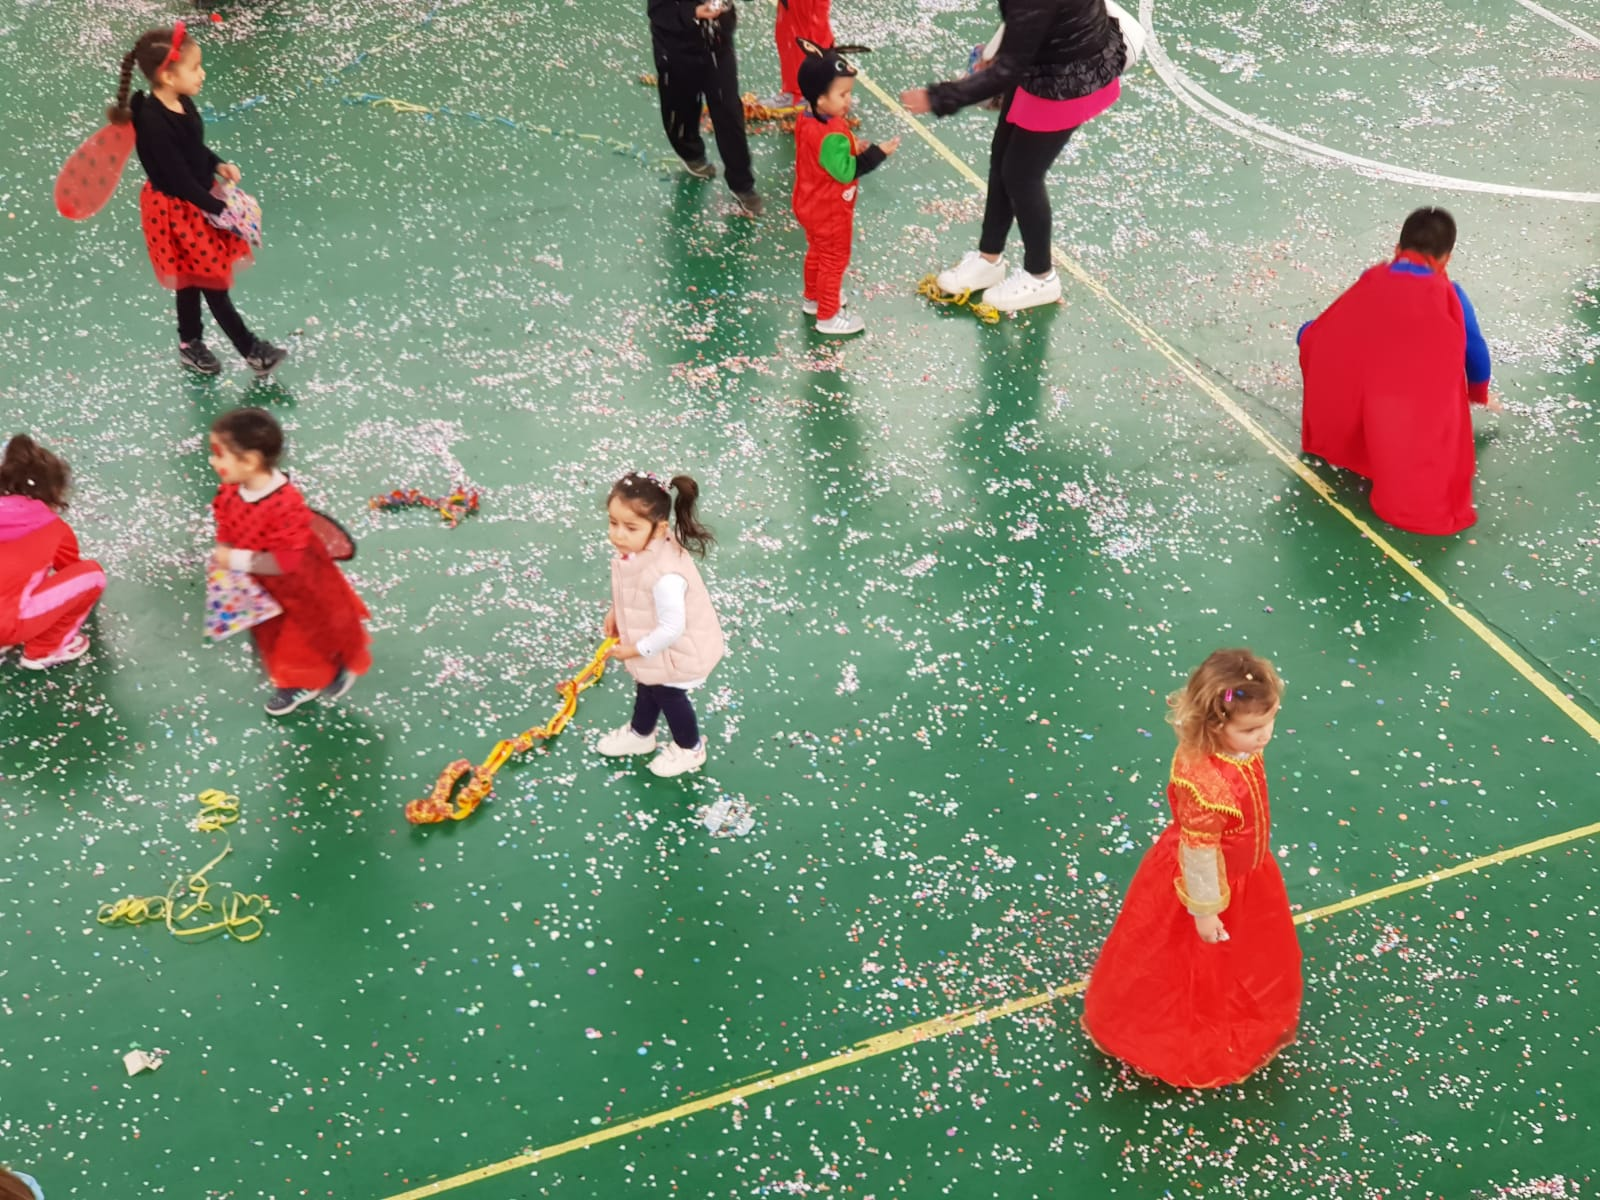 Baraonda Carnevale 2019 (6)